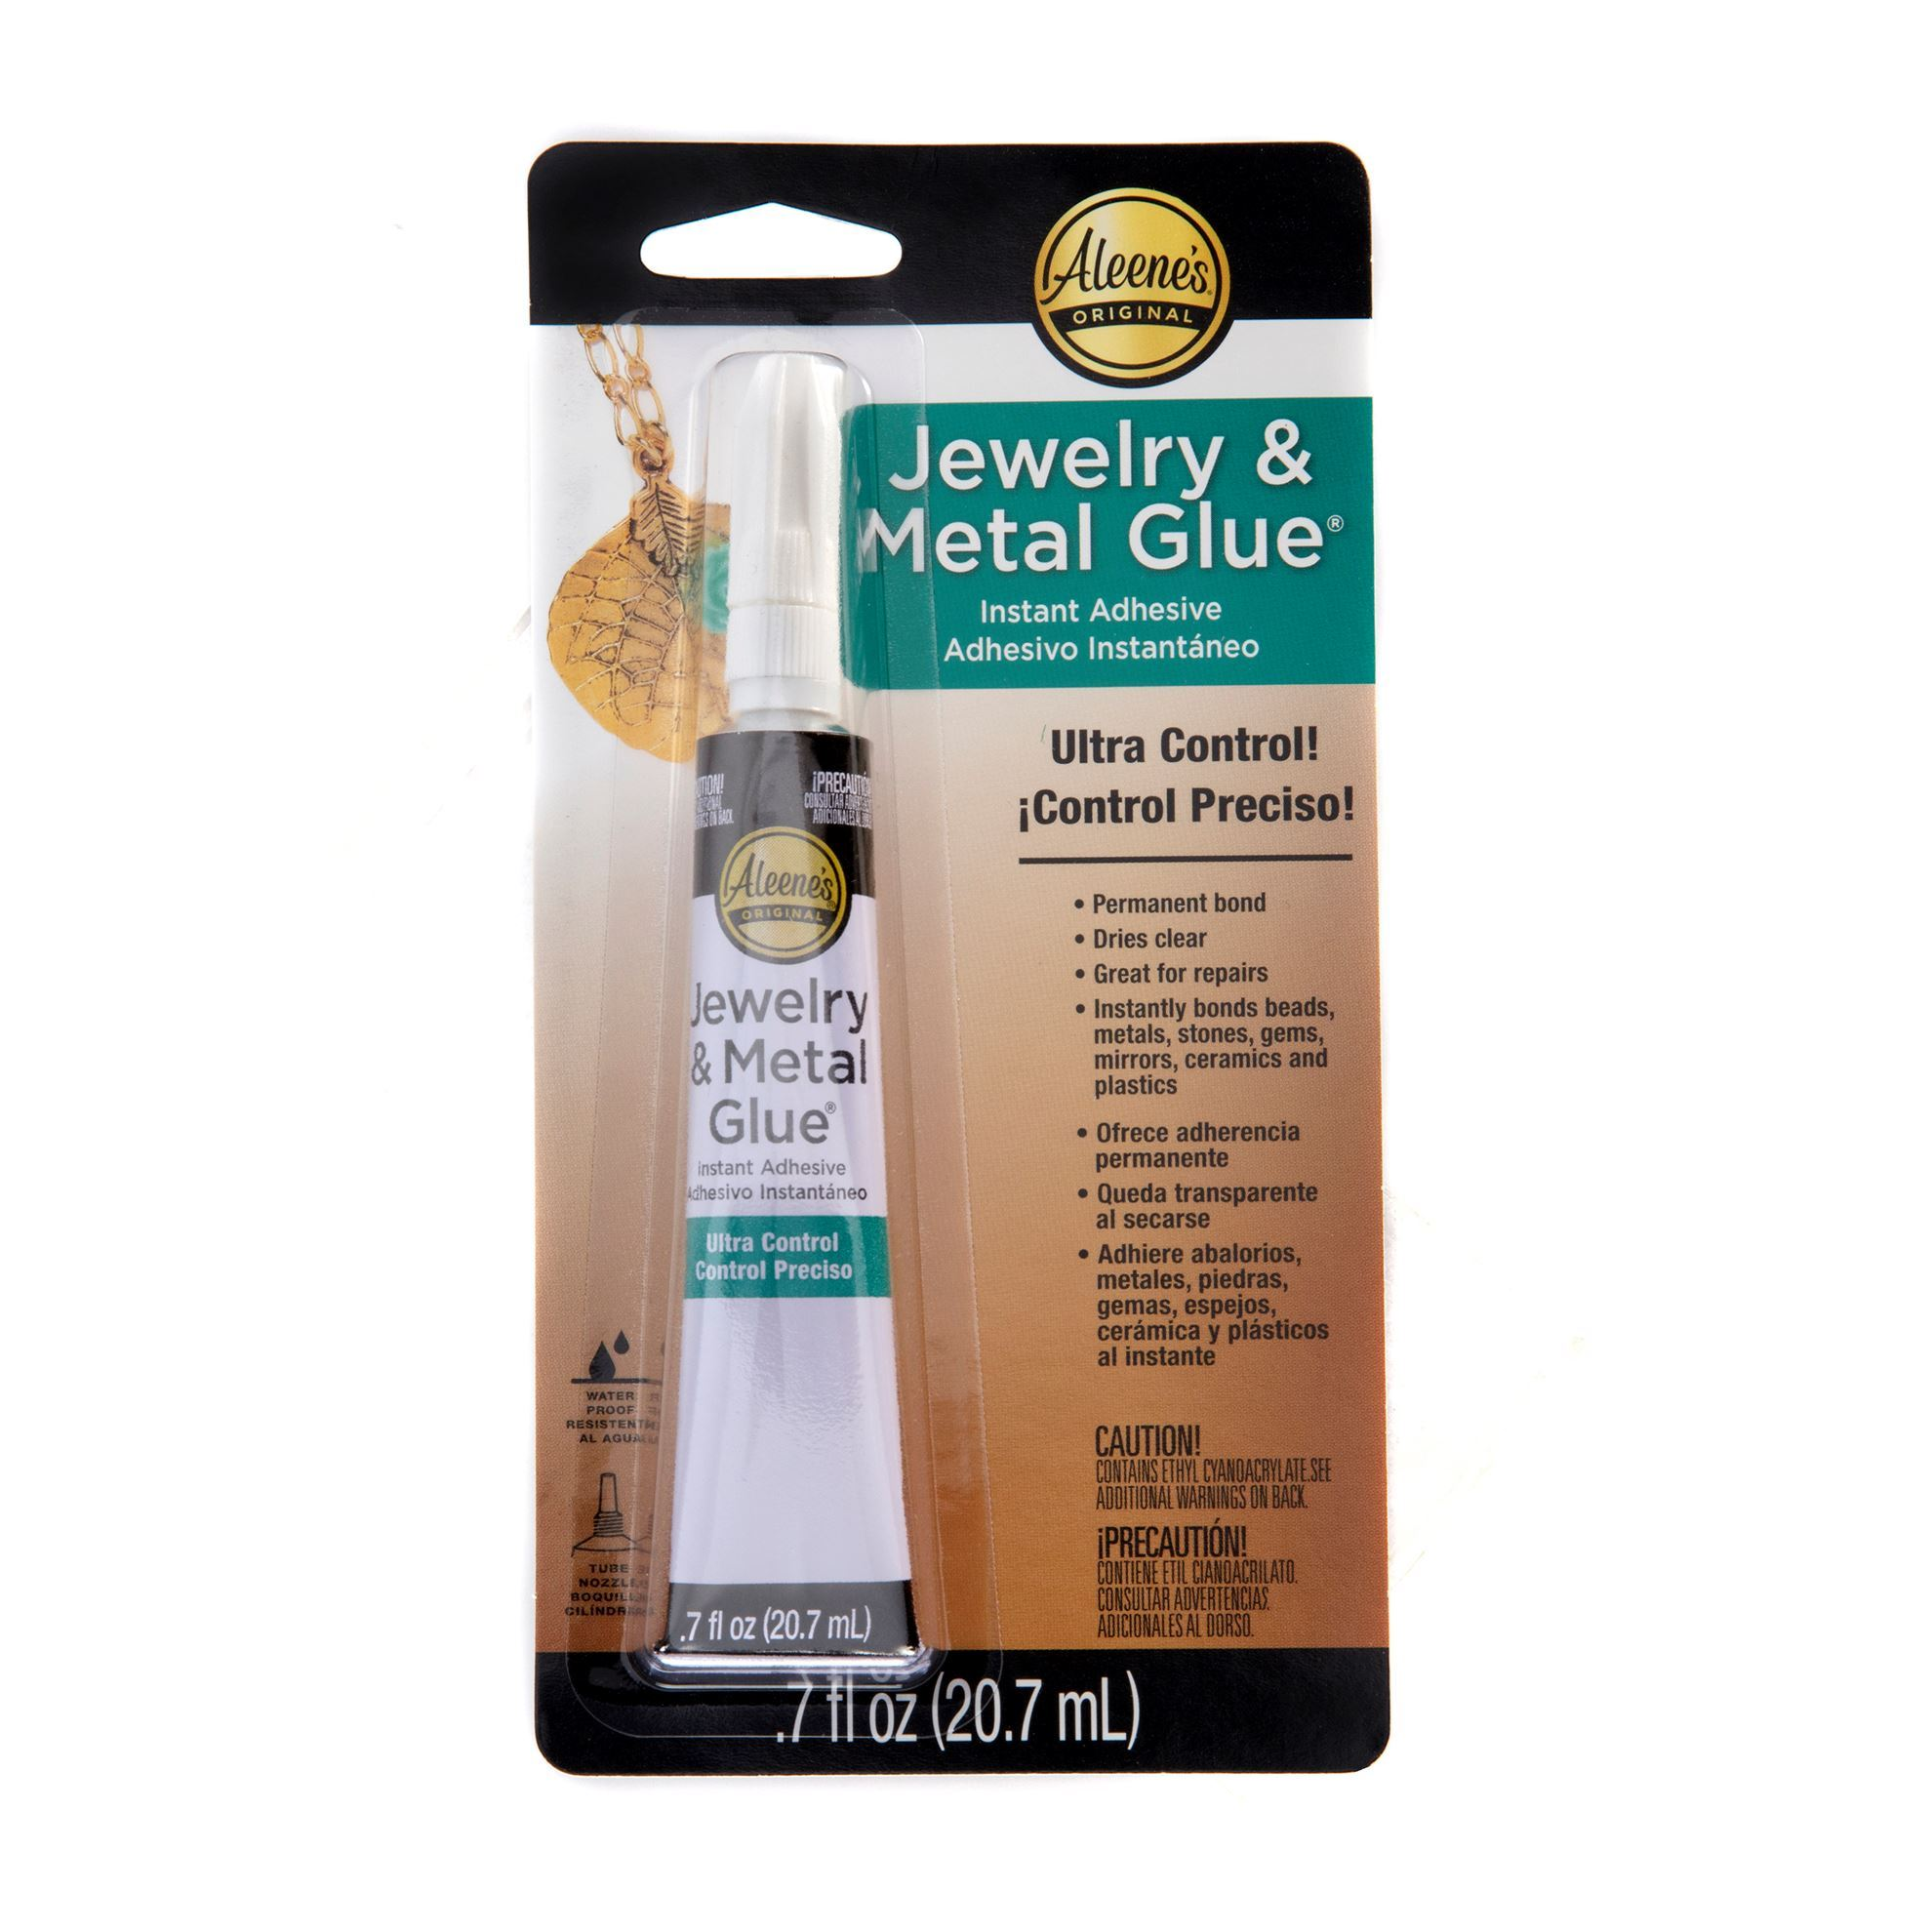 Aleene's® Jewelry & Metal Glue